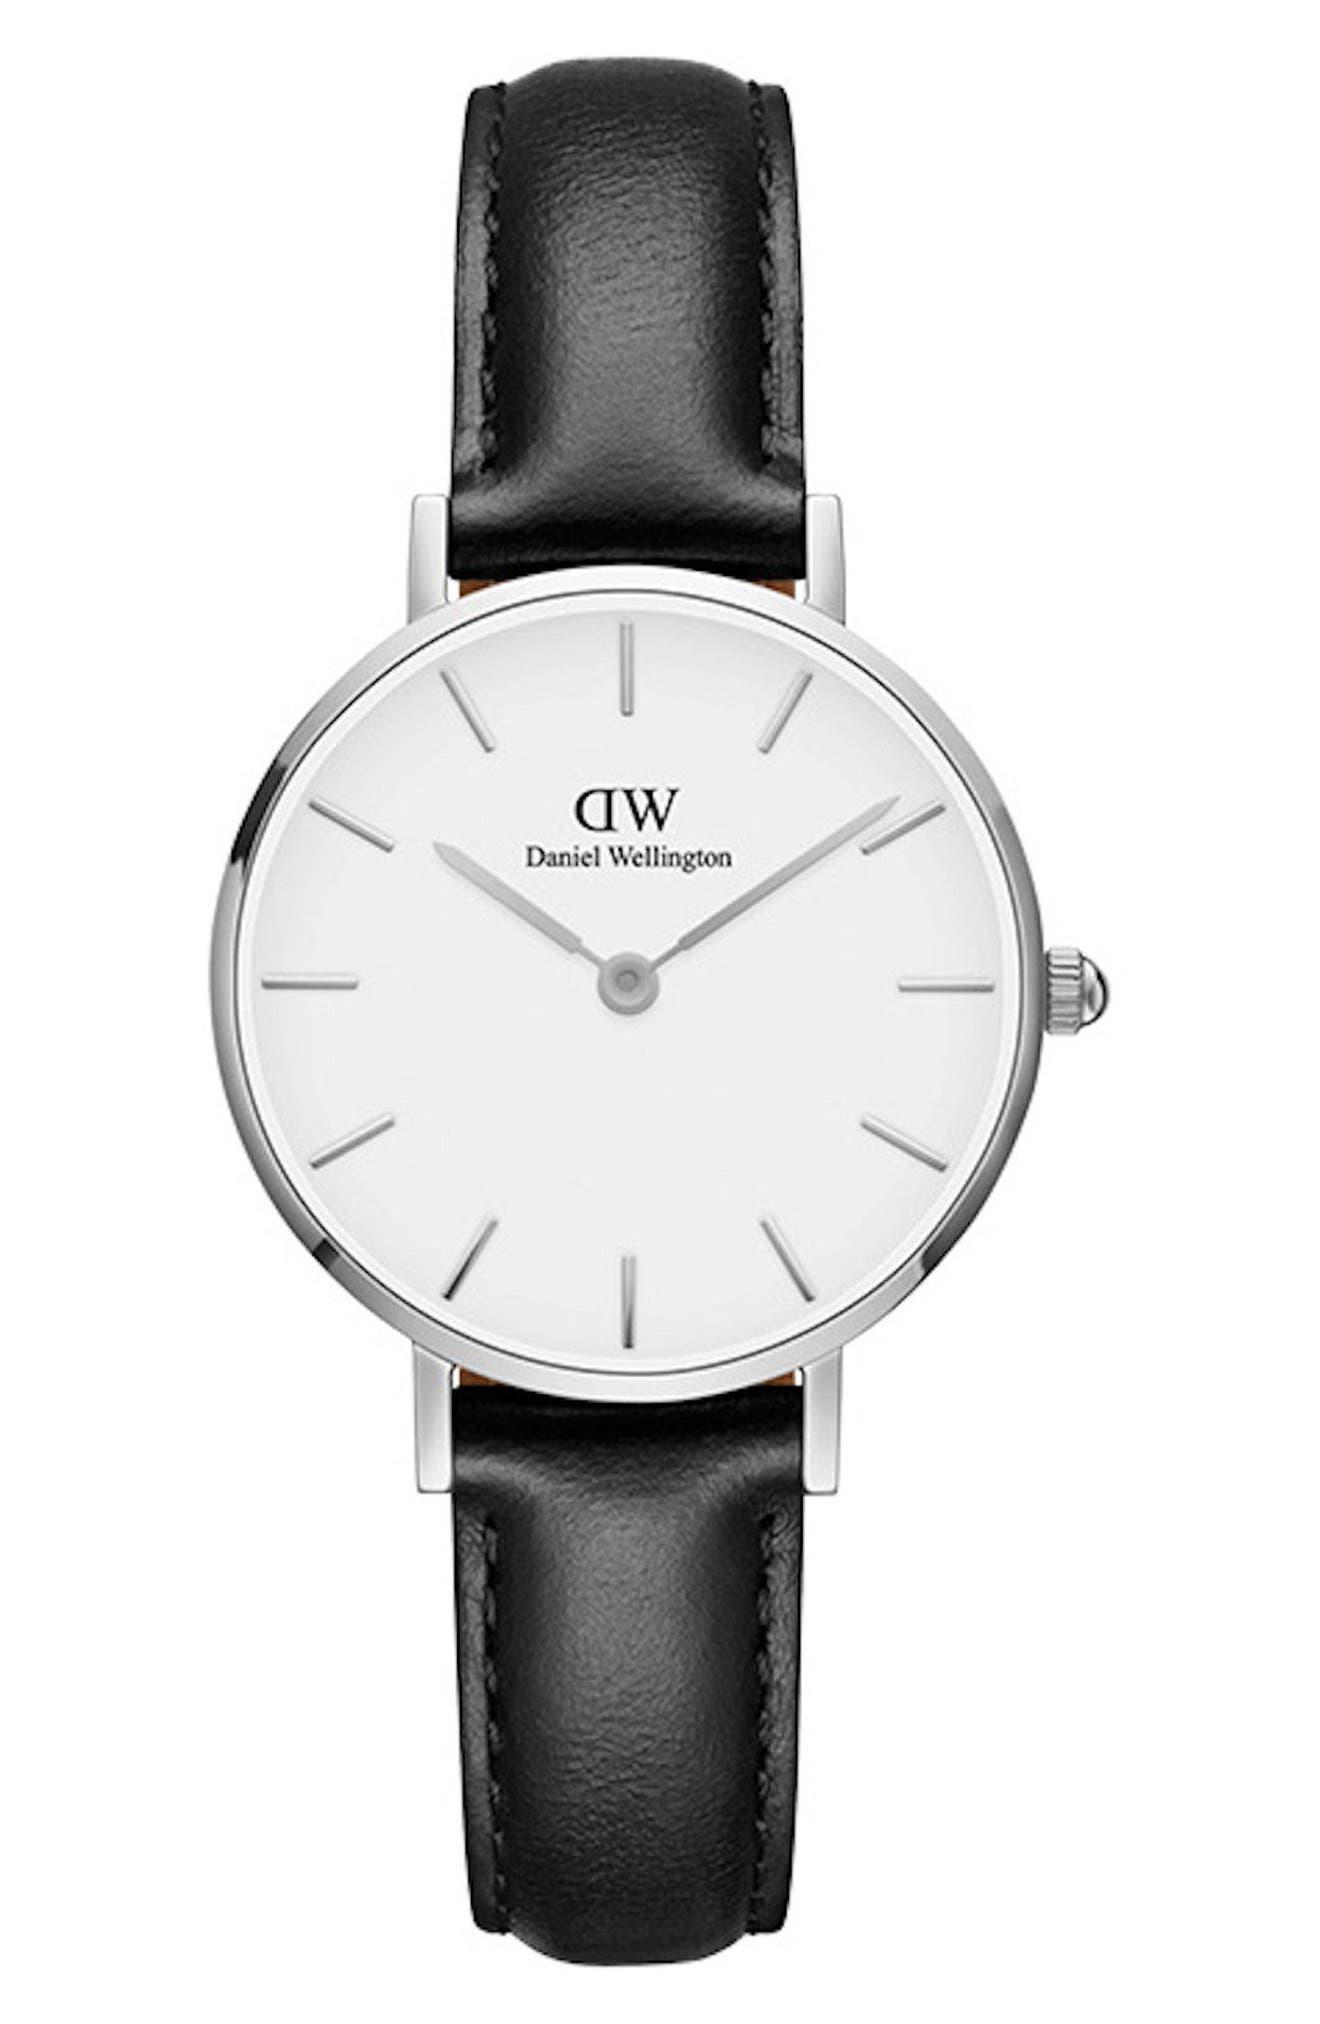 DANIEL WELLINGTON, Classic Petite Leather Strap Watch, 28mm, Main thumbnail 1, color, BLACK/ WHITE/ SILVER